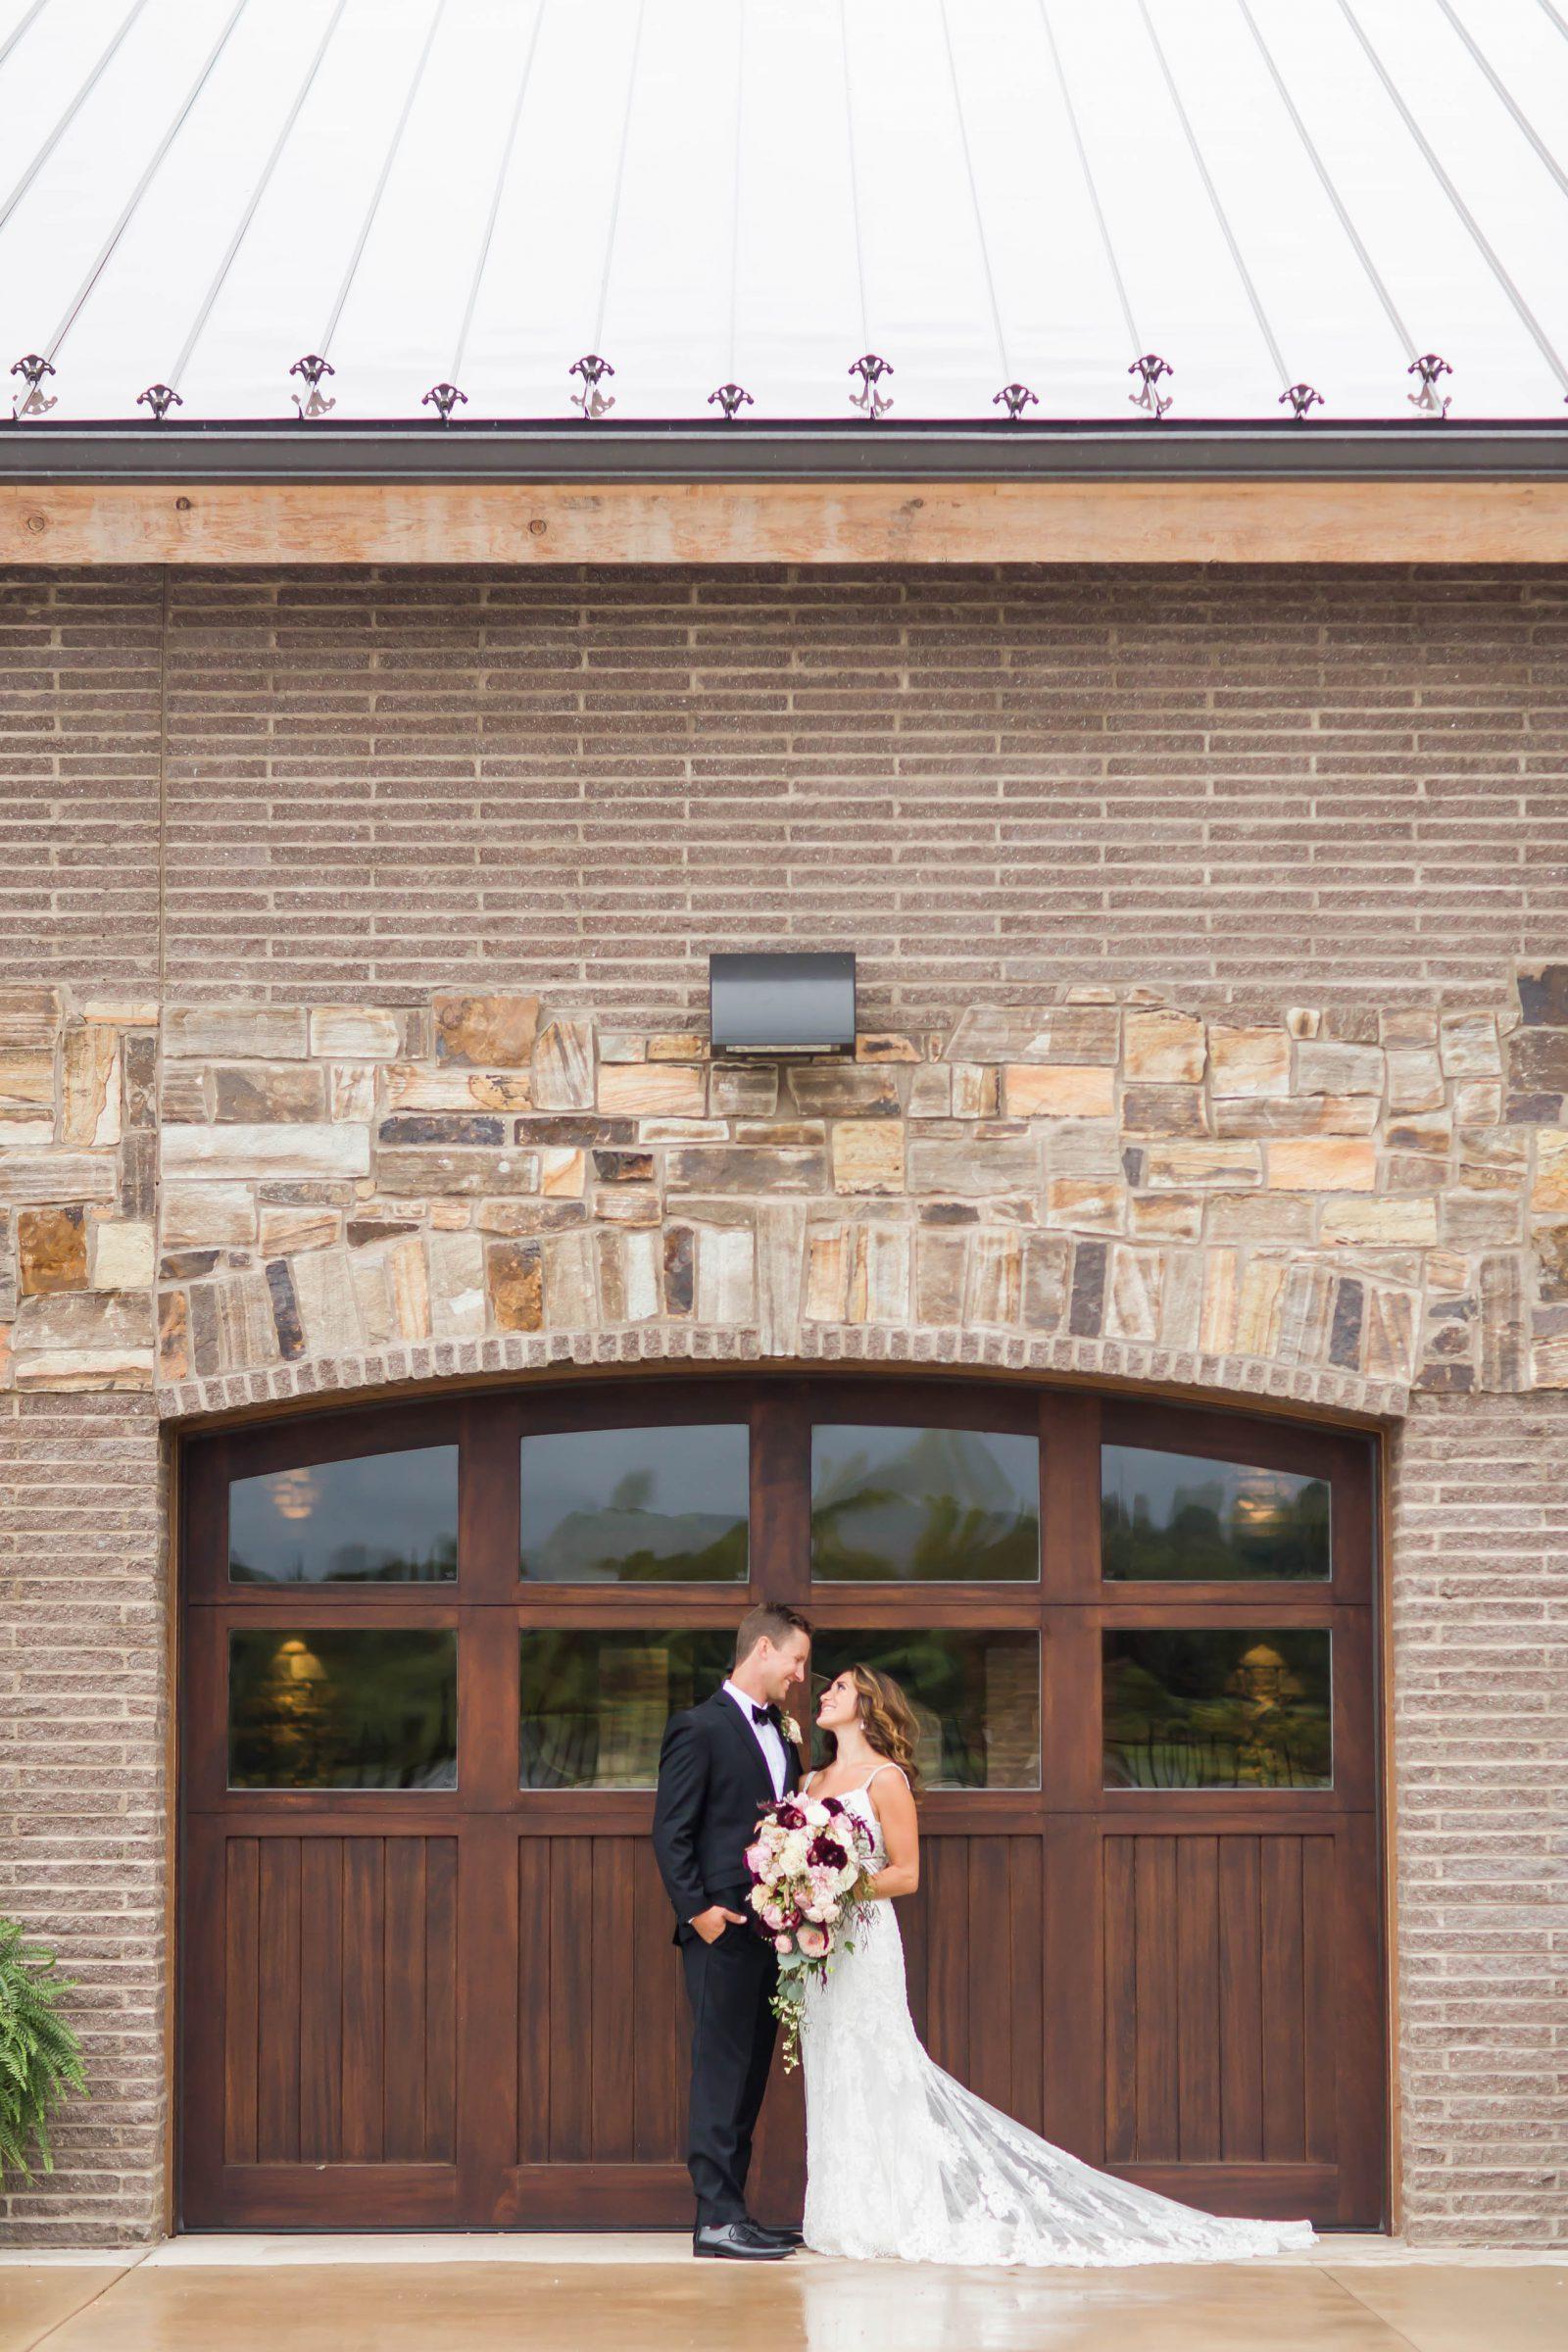 sunny-hill-wedding-venue-loren-jackson-photography-61